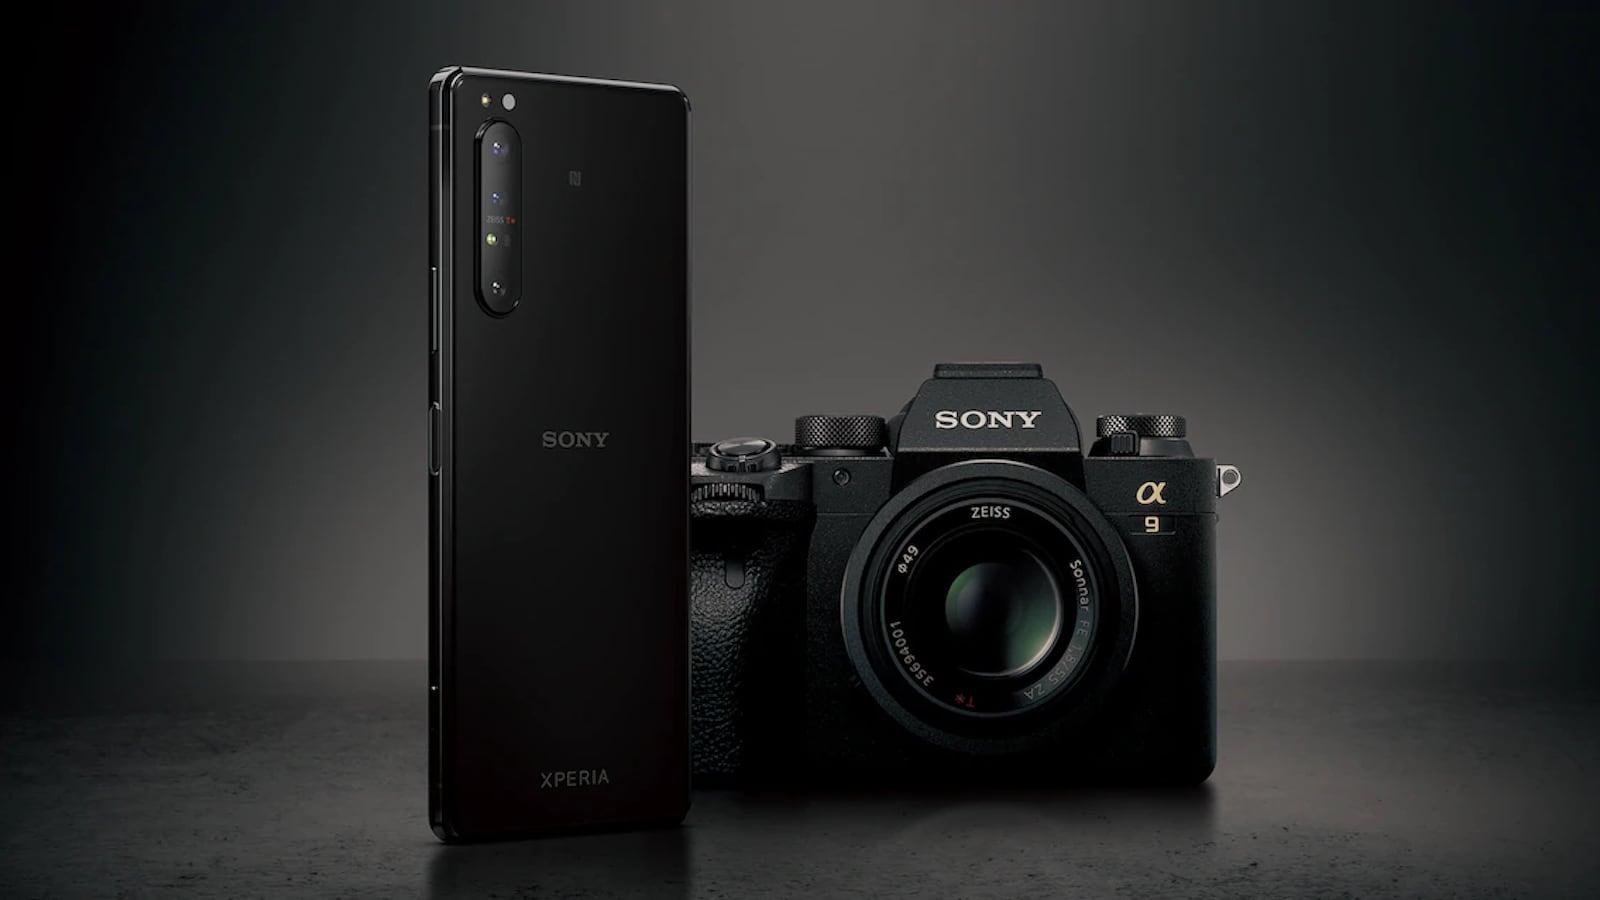 Sony Xperia 1 II Alpha Camera Smartphone